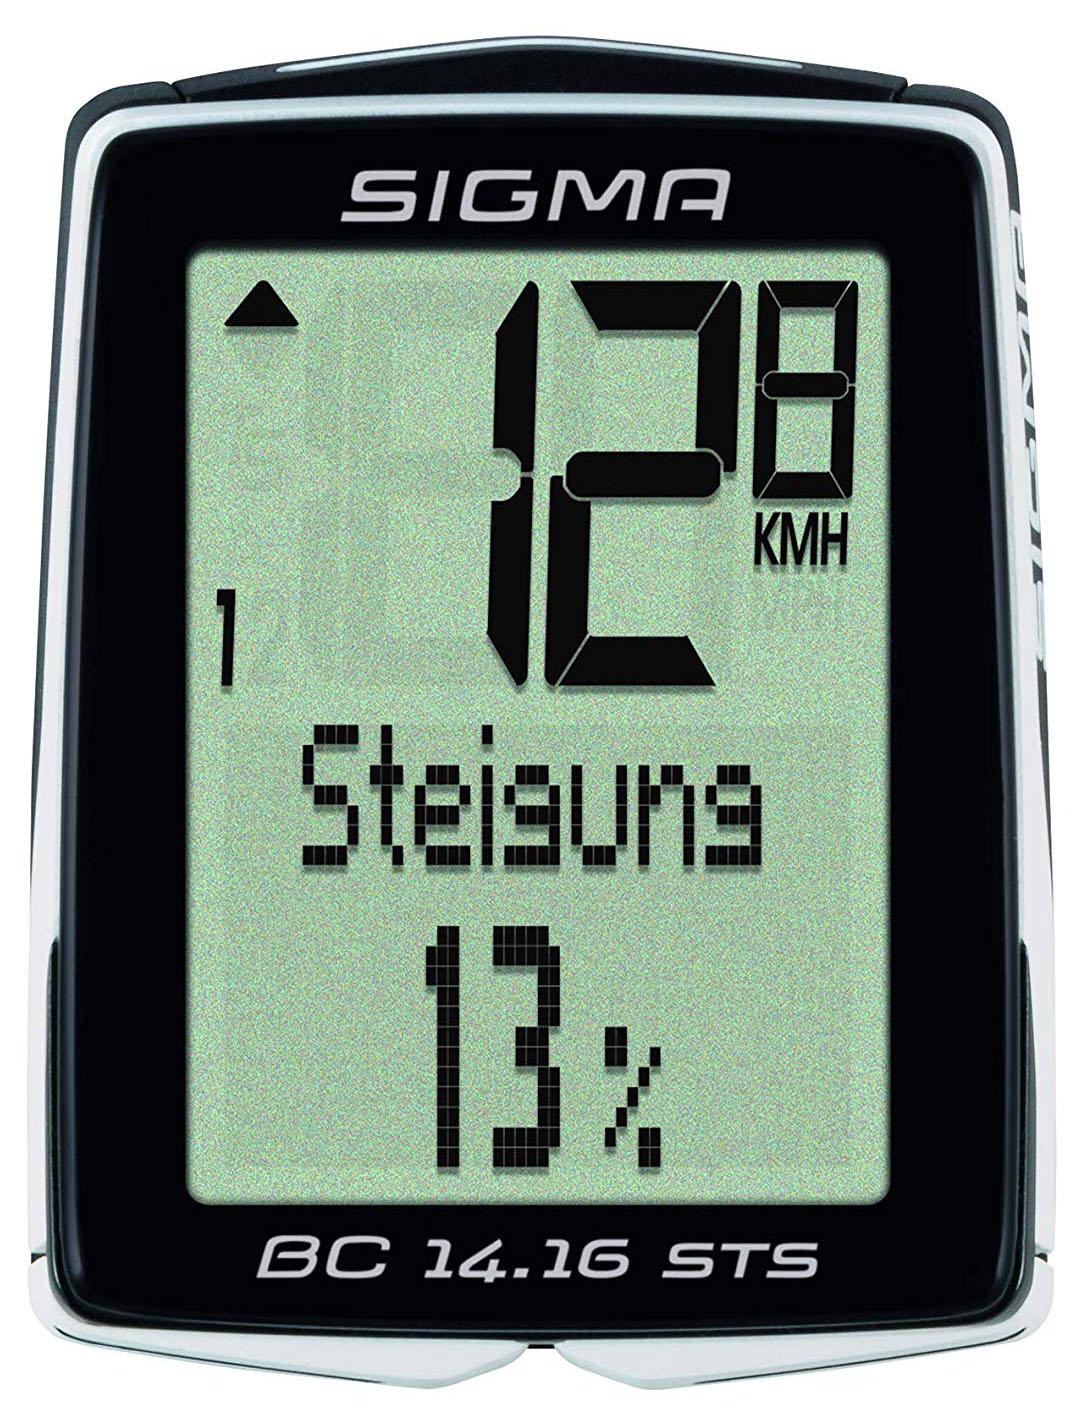 Аксессуар SIGMA BC 14.16 STS (01417) датчик sigma скорости беспроводной sts арт 00439